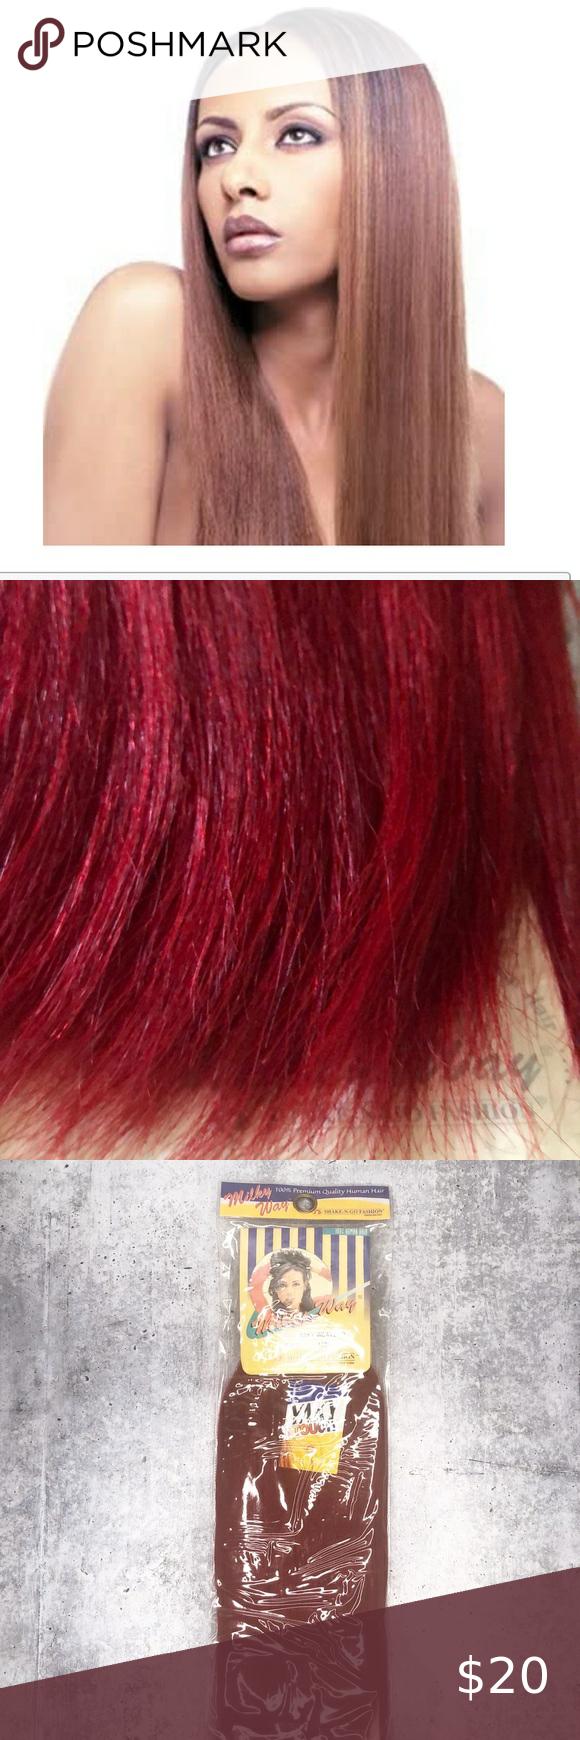 Milky Way 100% Human Hair Weave - SPIRAL ROLL 4PCS (8/10